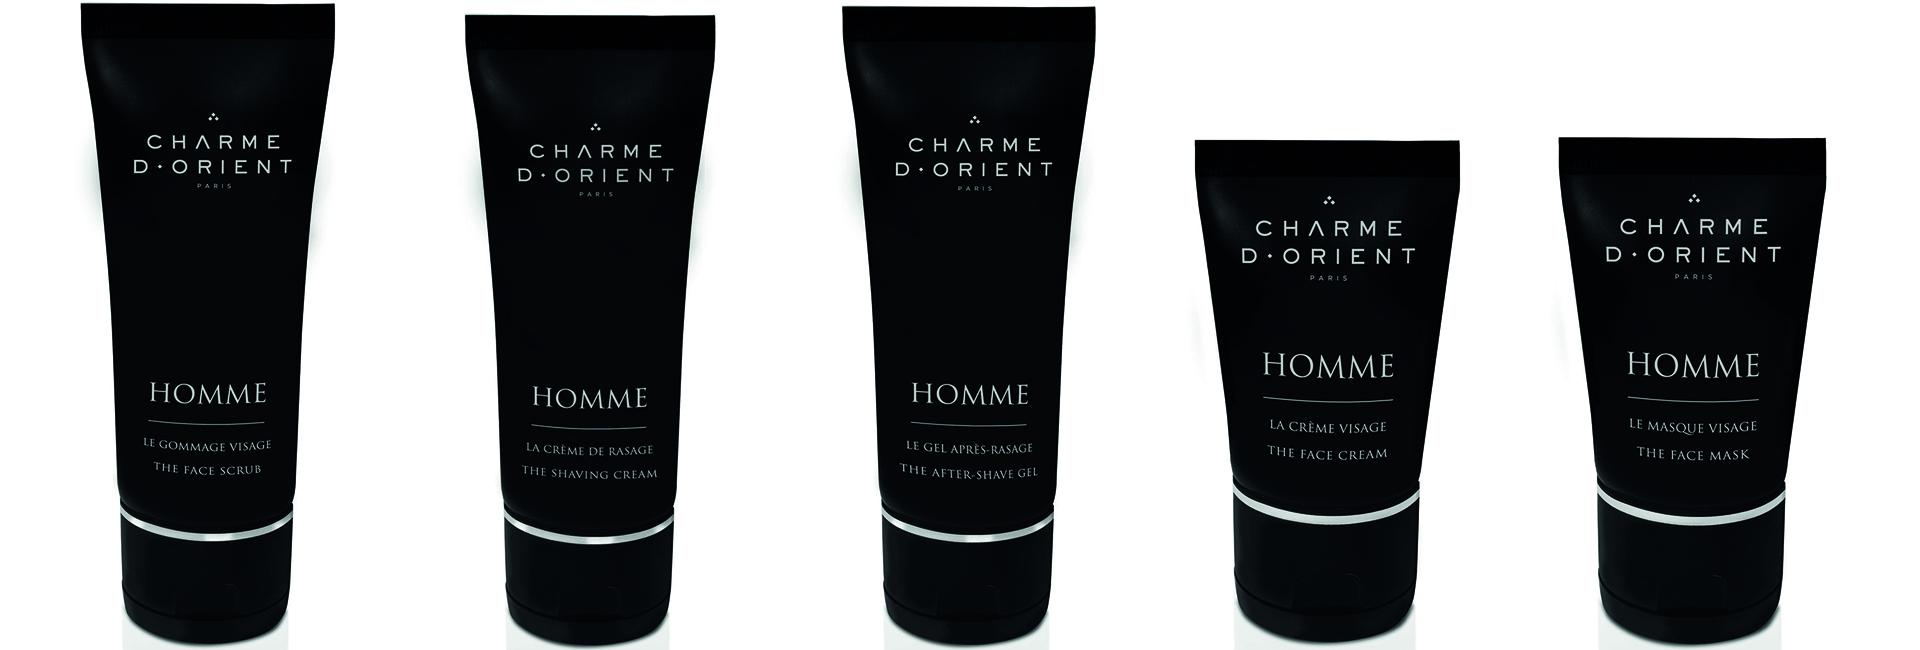 gamme-homme-charme-orient-blog-beaute-soin-parfum